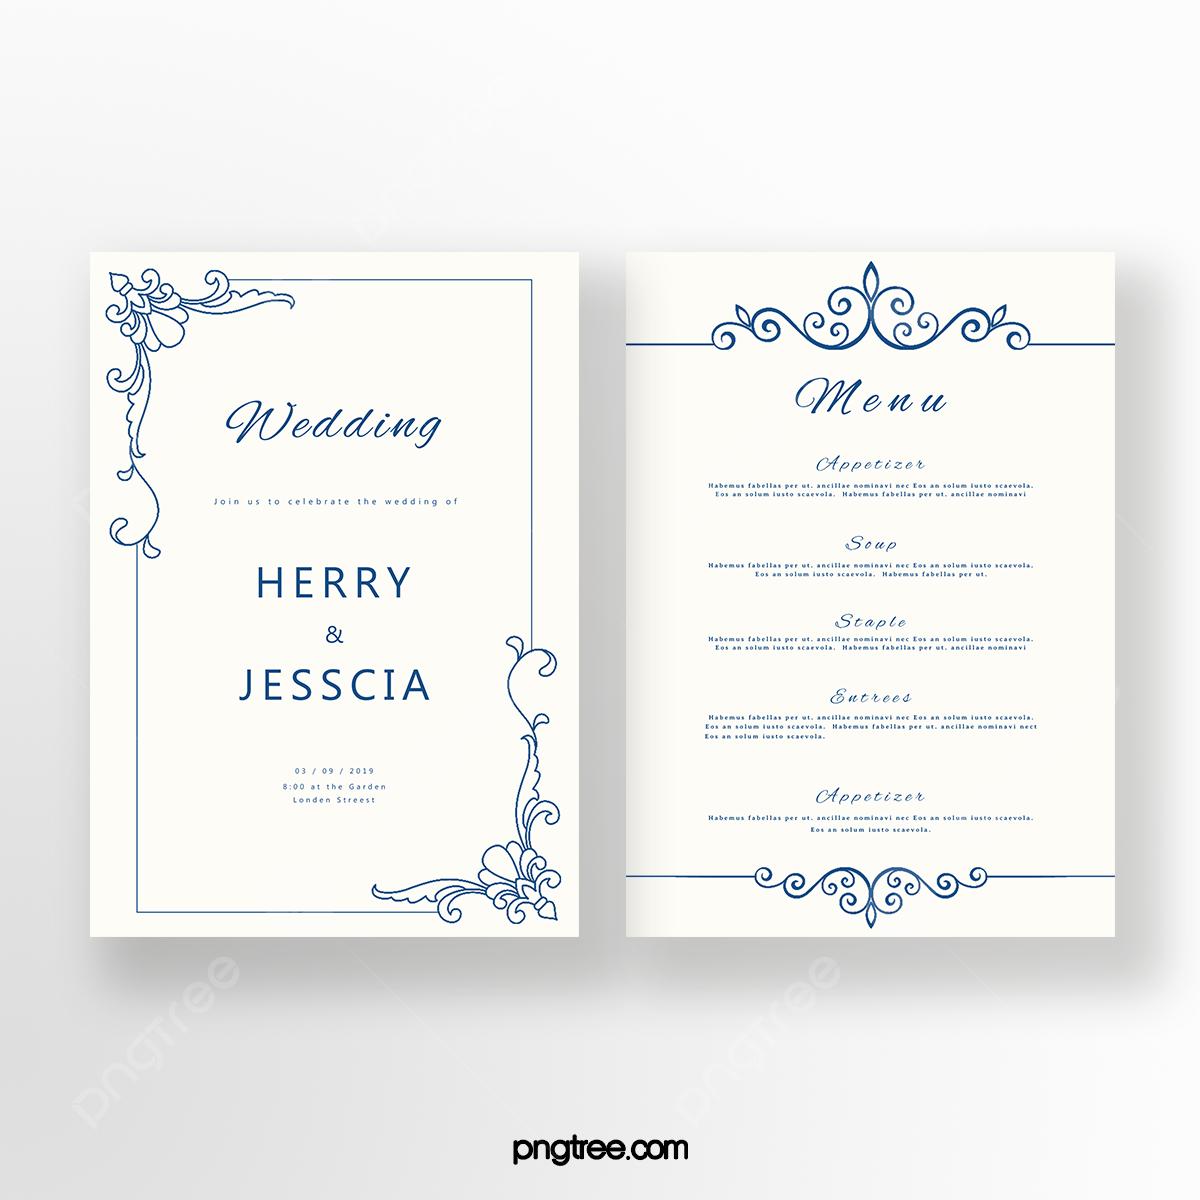 Simple Cobalt Blue European Wedding Invitation Letter Template for Free  Download on Pngtree